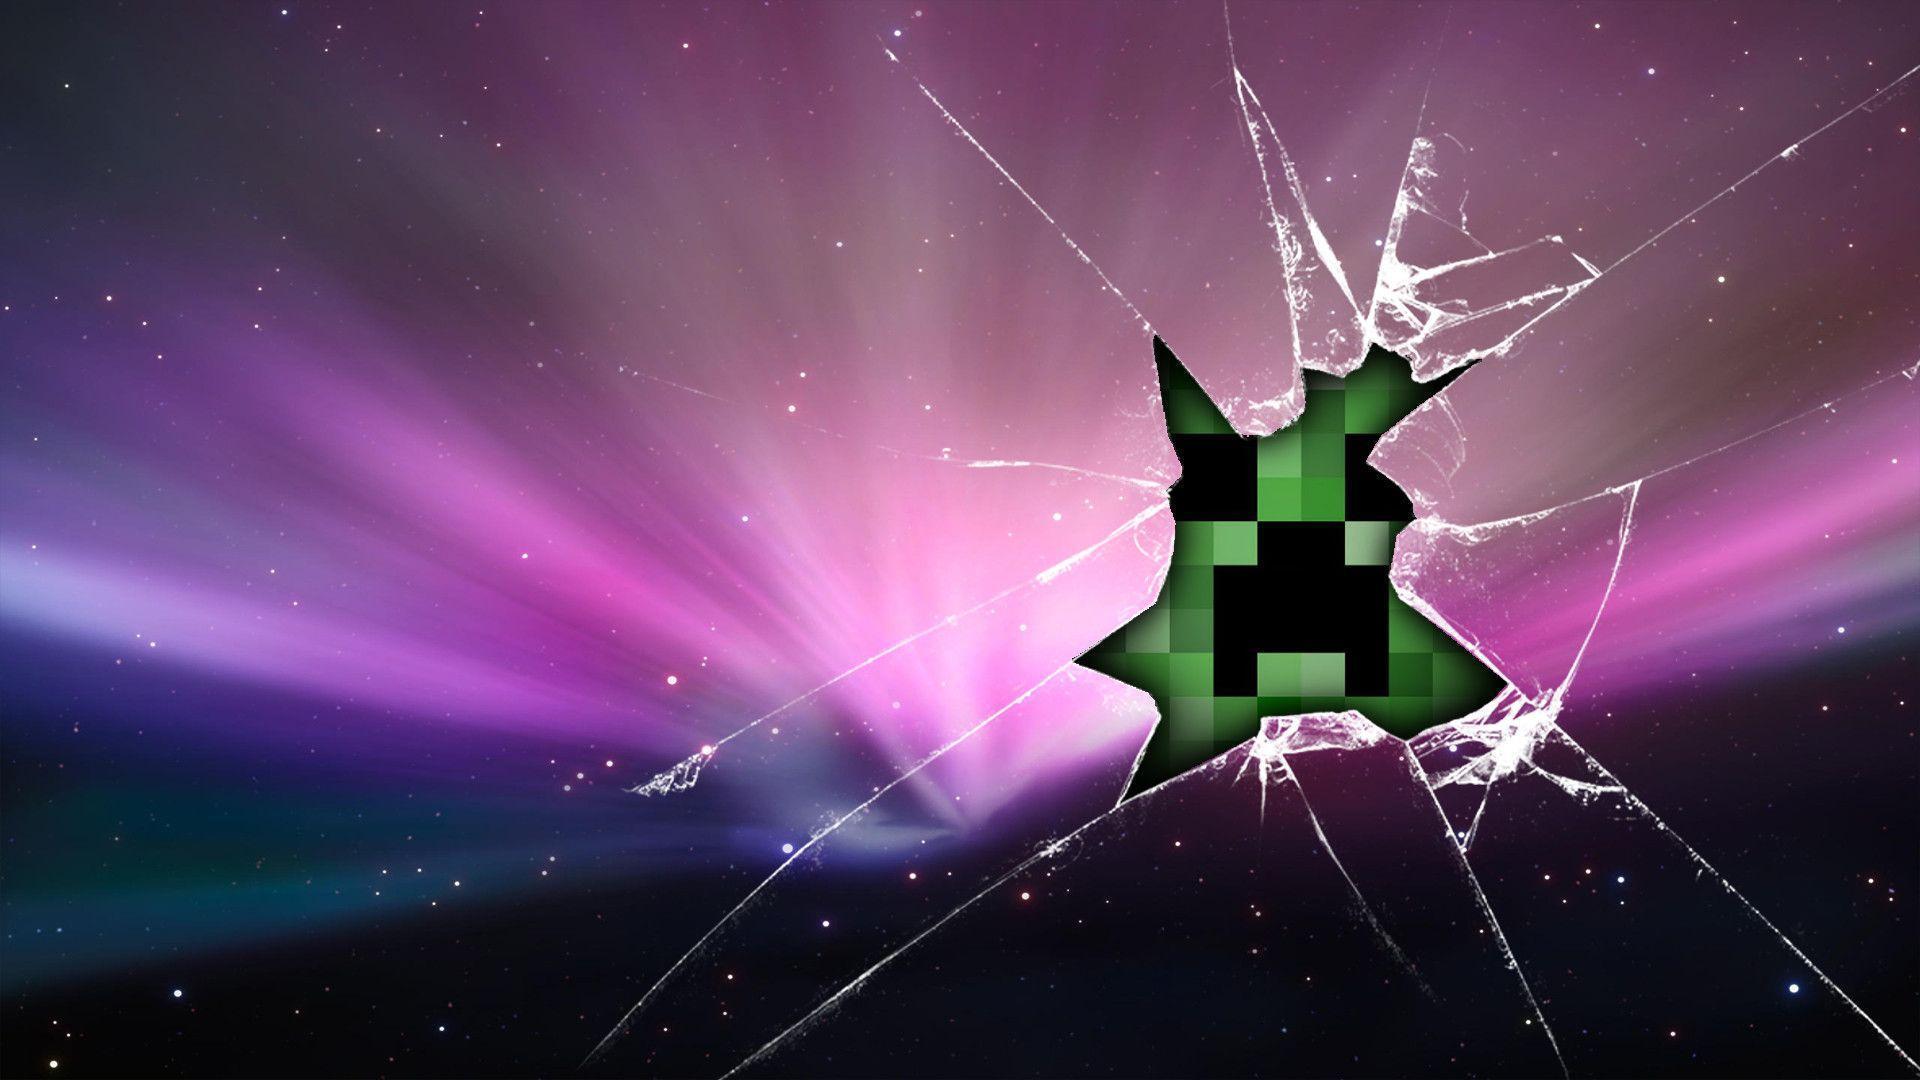 Epic Minecraft Screensavers